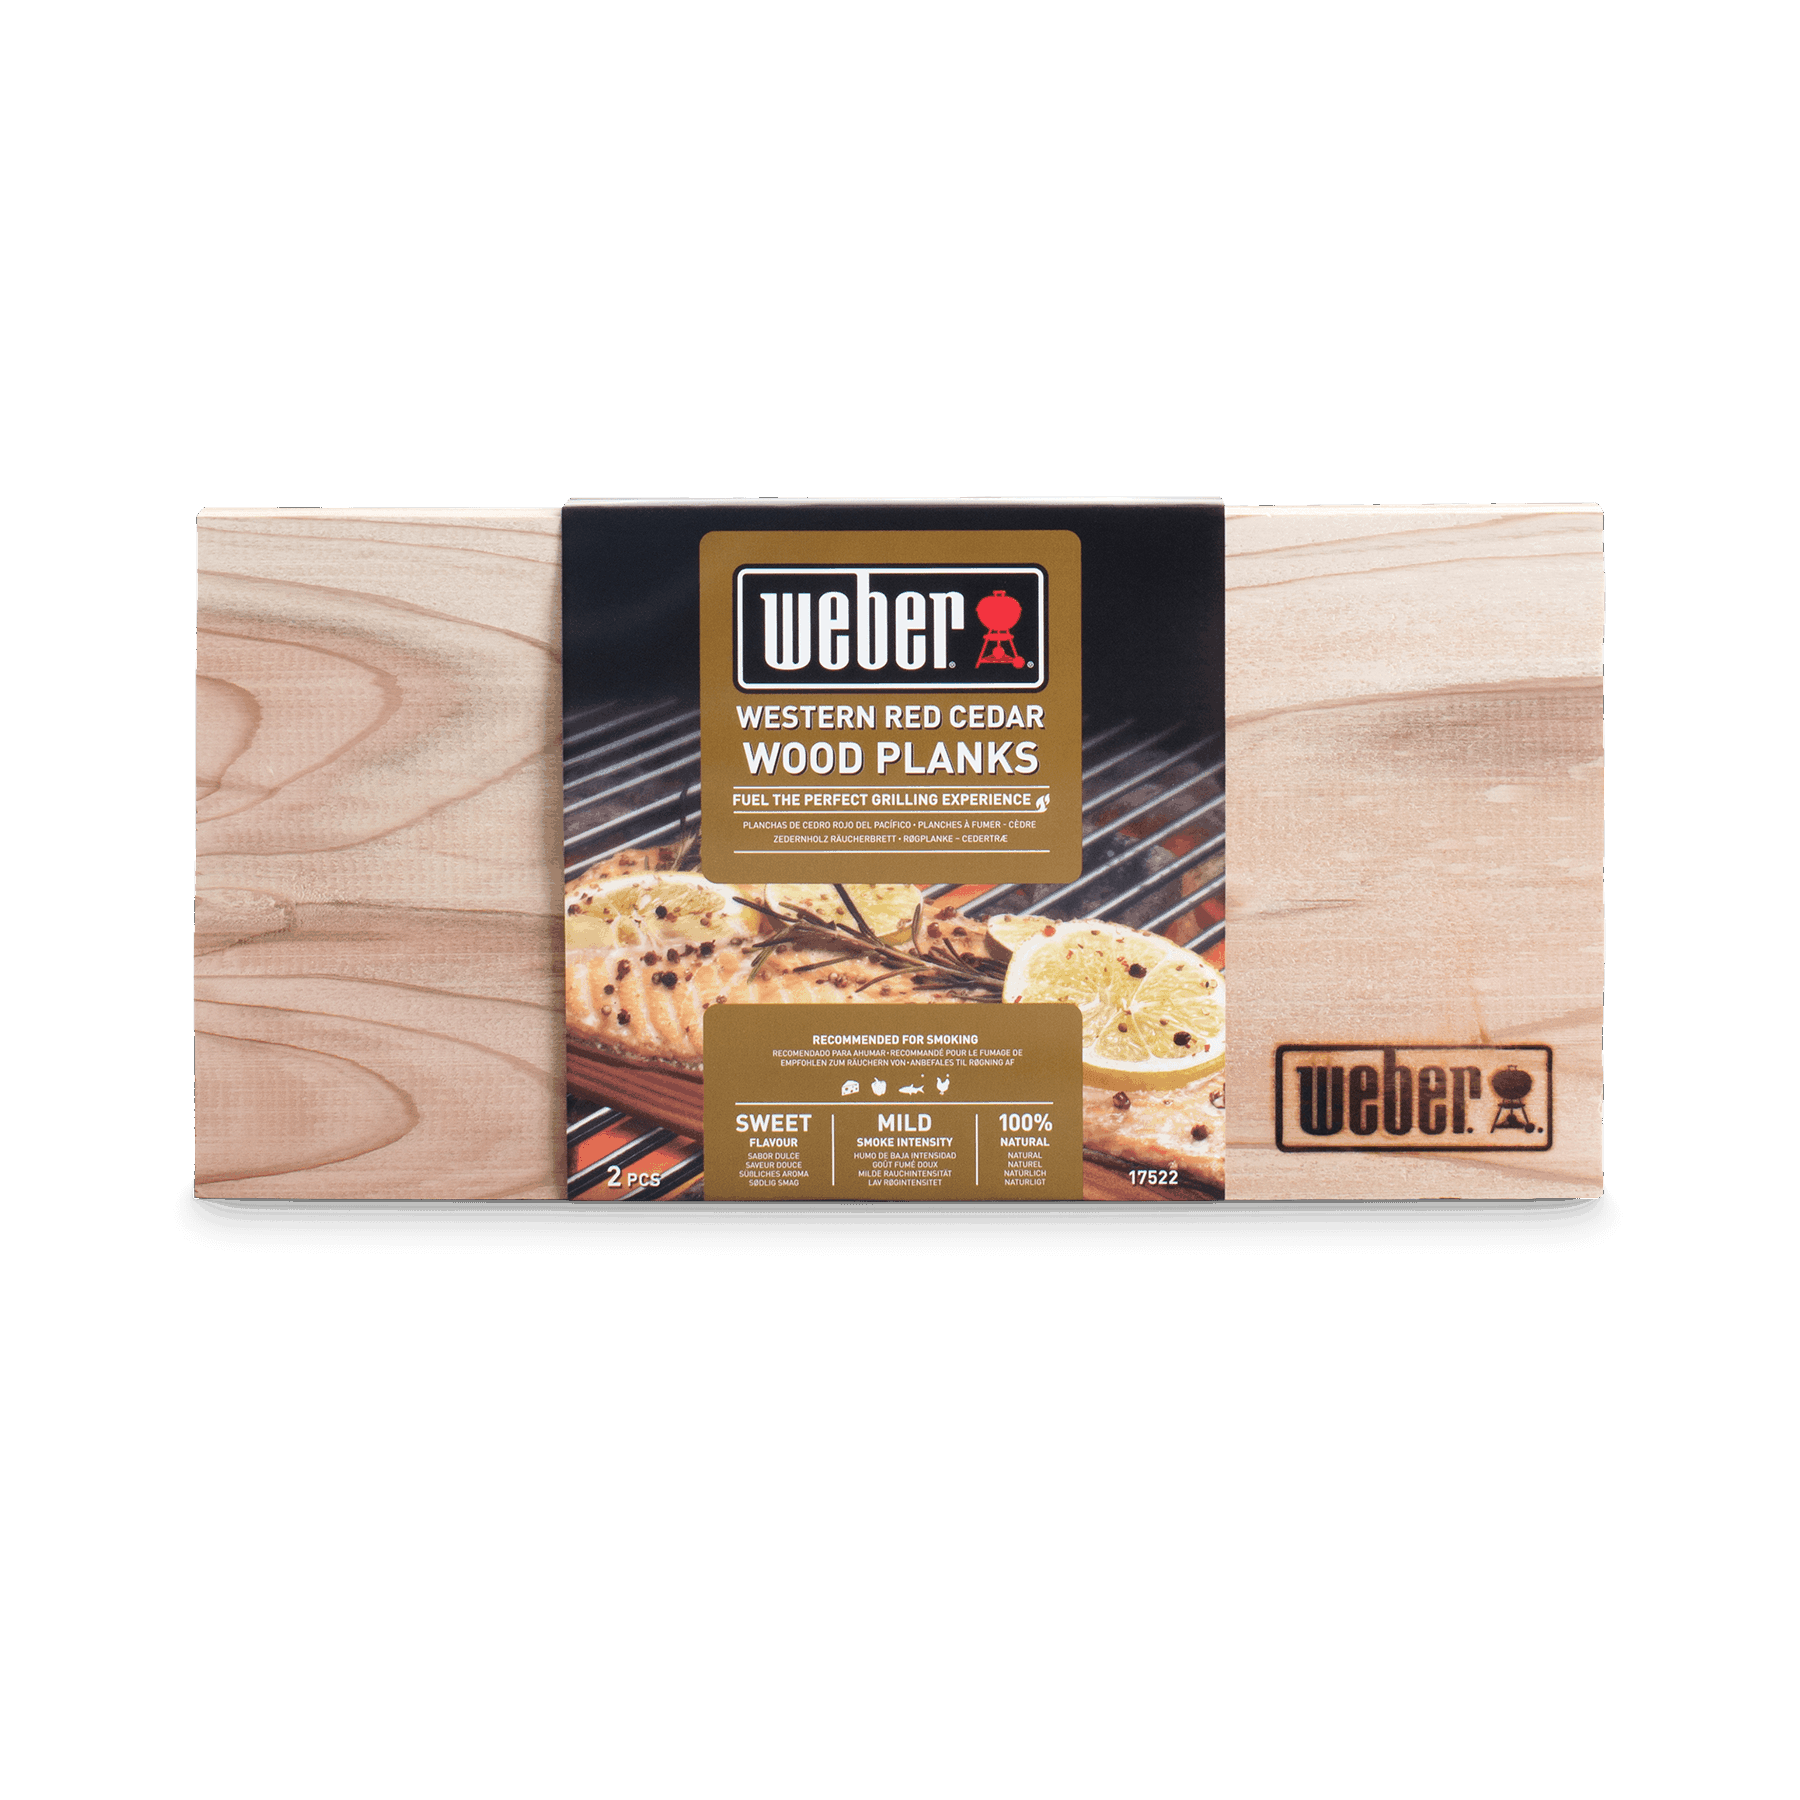 Western Red Cedar Wood Planks - Small